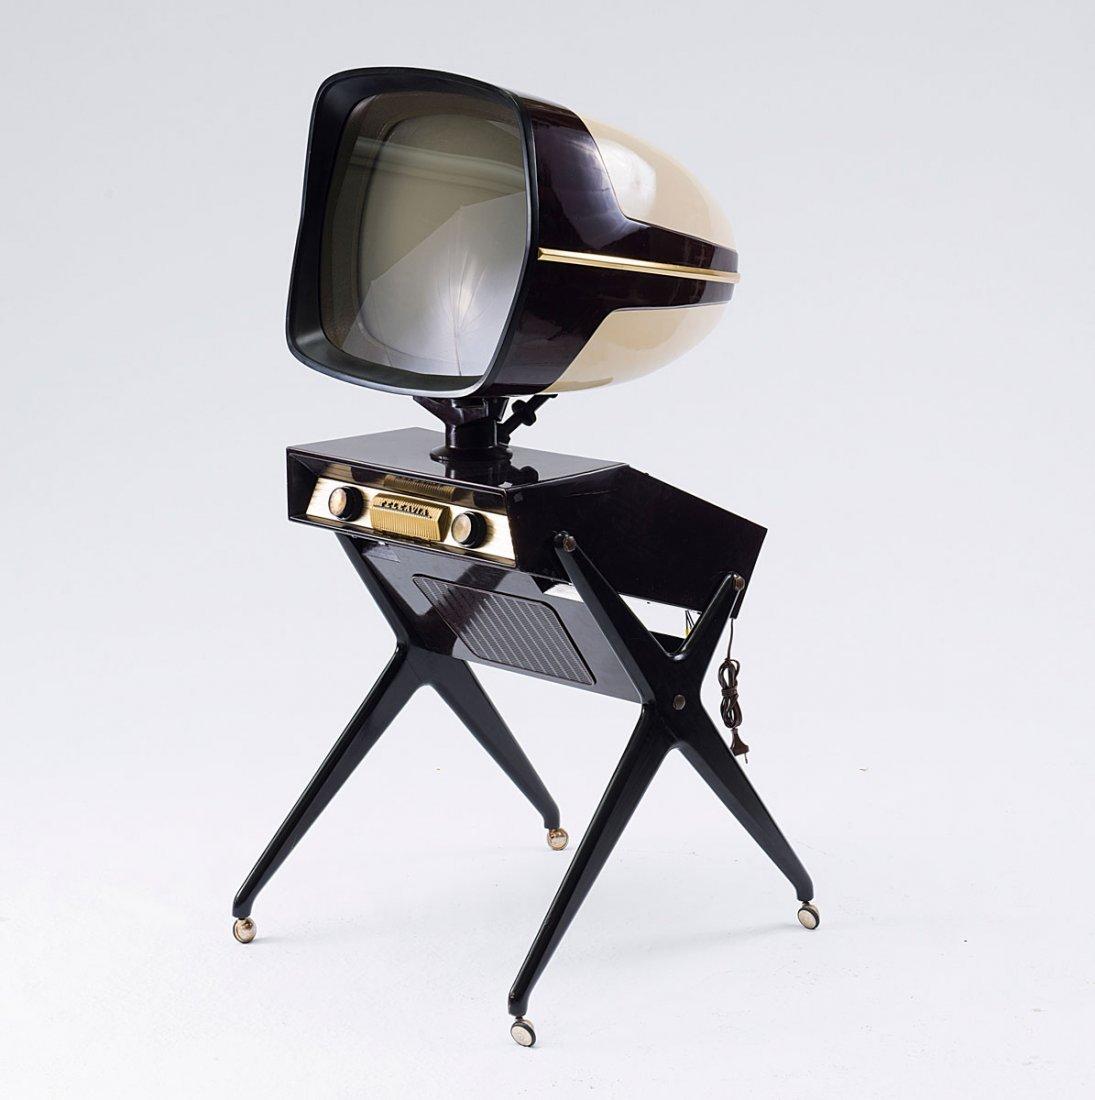 Teleavia, France. 'Teleavia' TV set, 1950s. H. 138 x 65